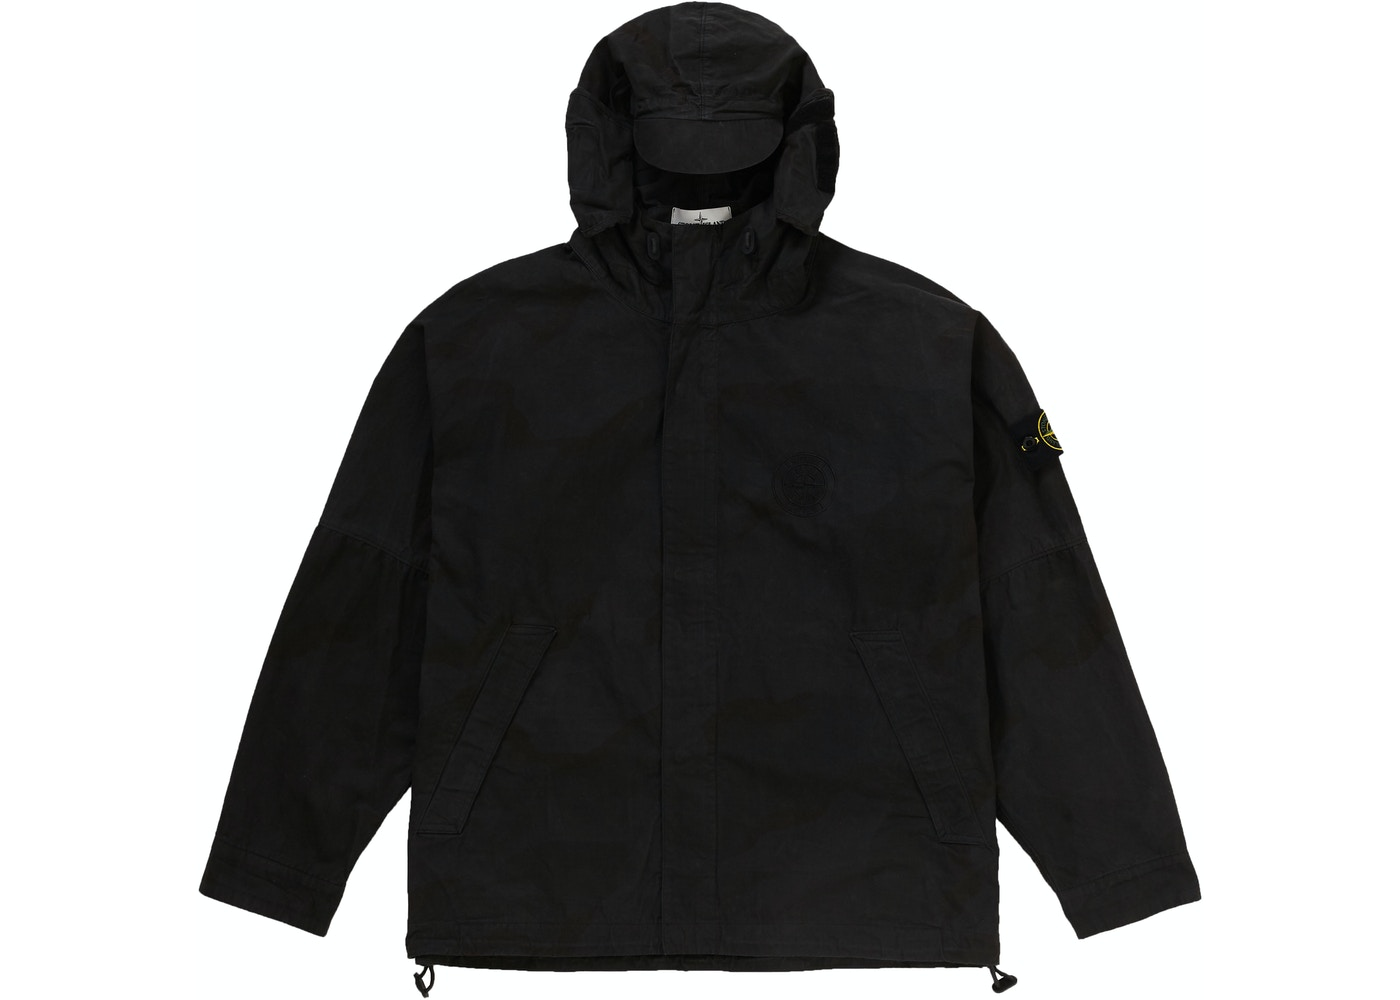 7e349f31c7996 Supreme Stone Island Riot Mask Camo Jacket Black Camo - SS19